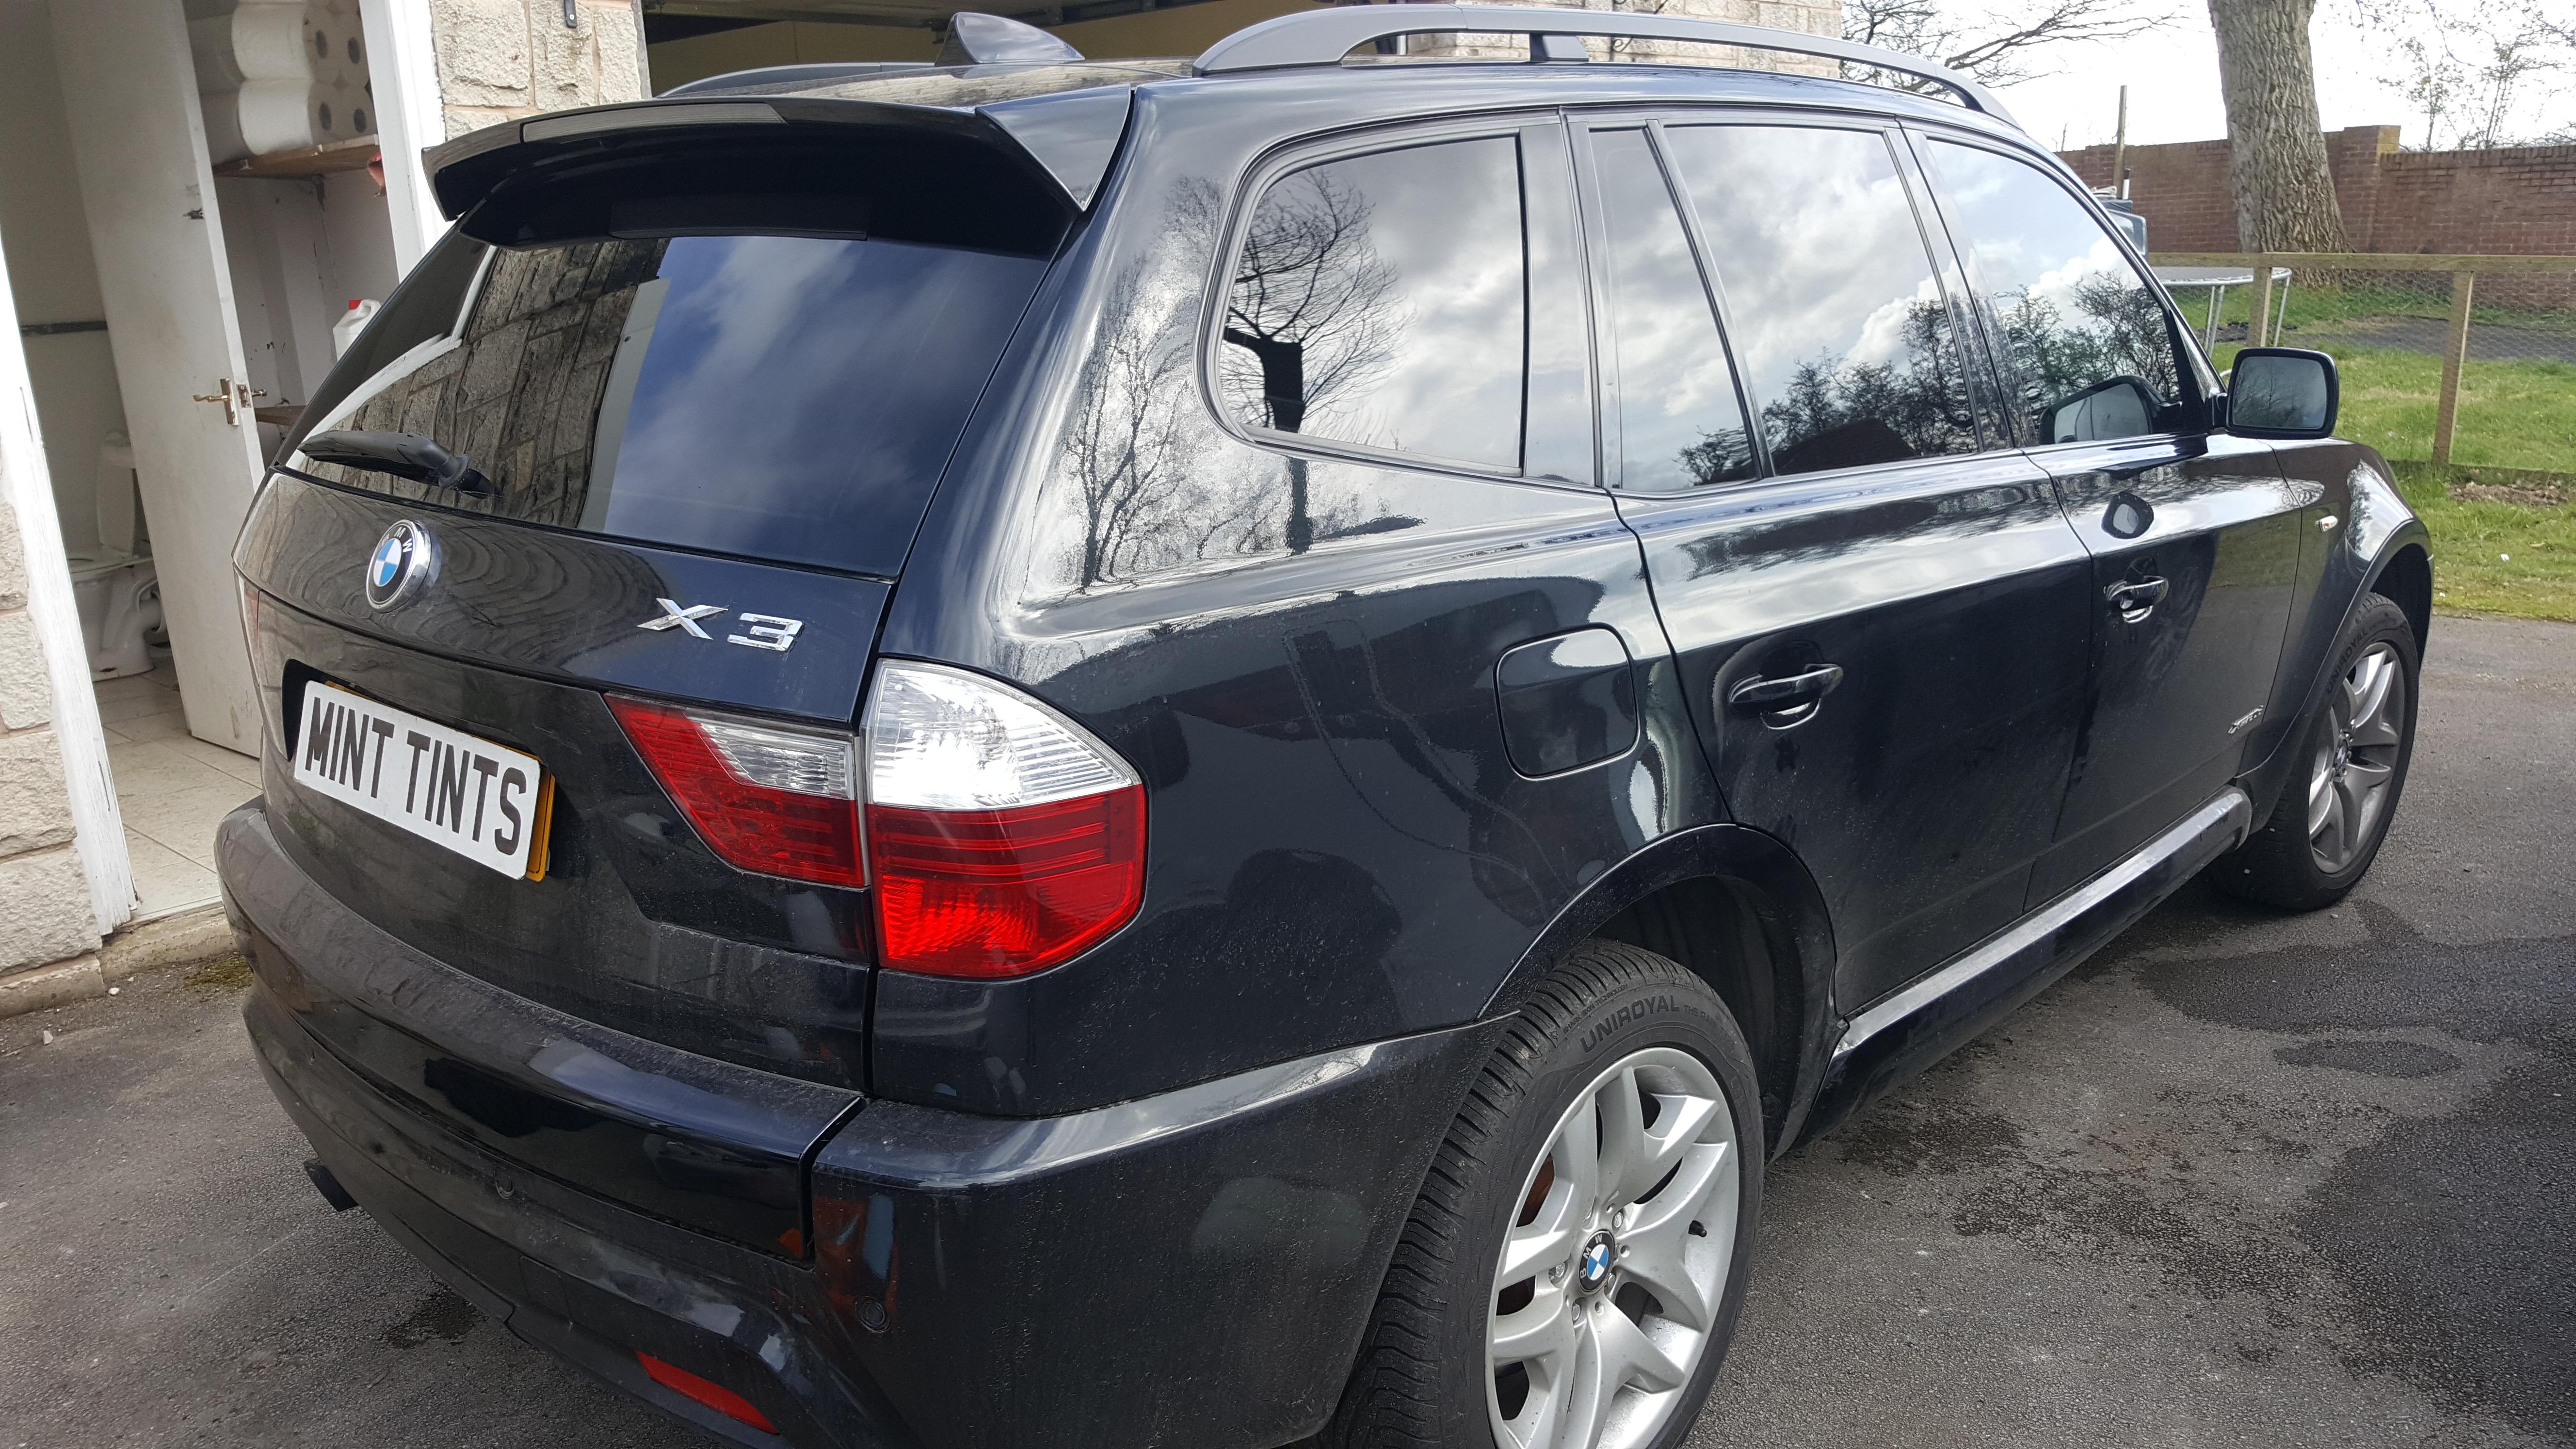 BMW X3 - 5% Limo Black Tint